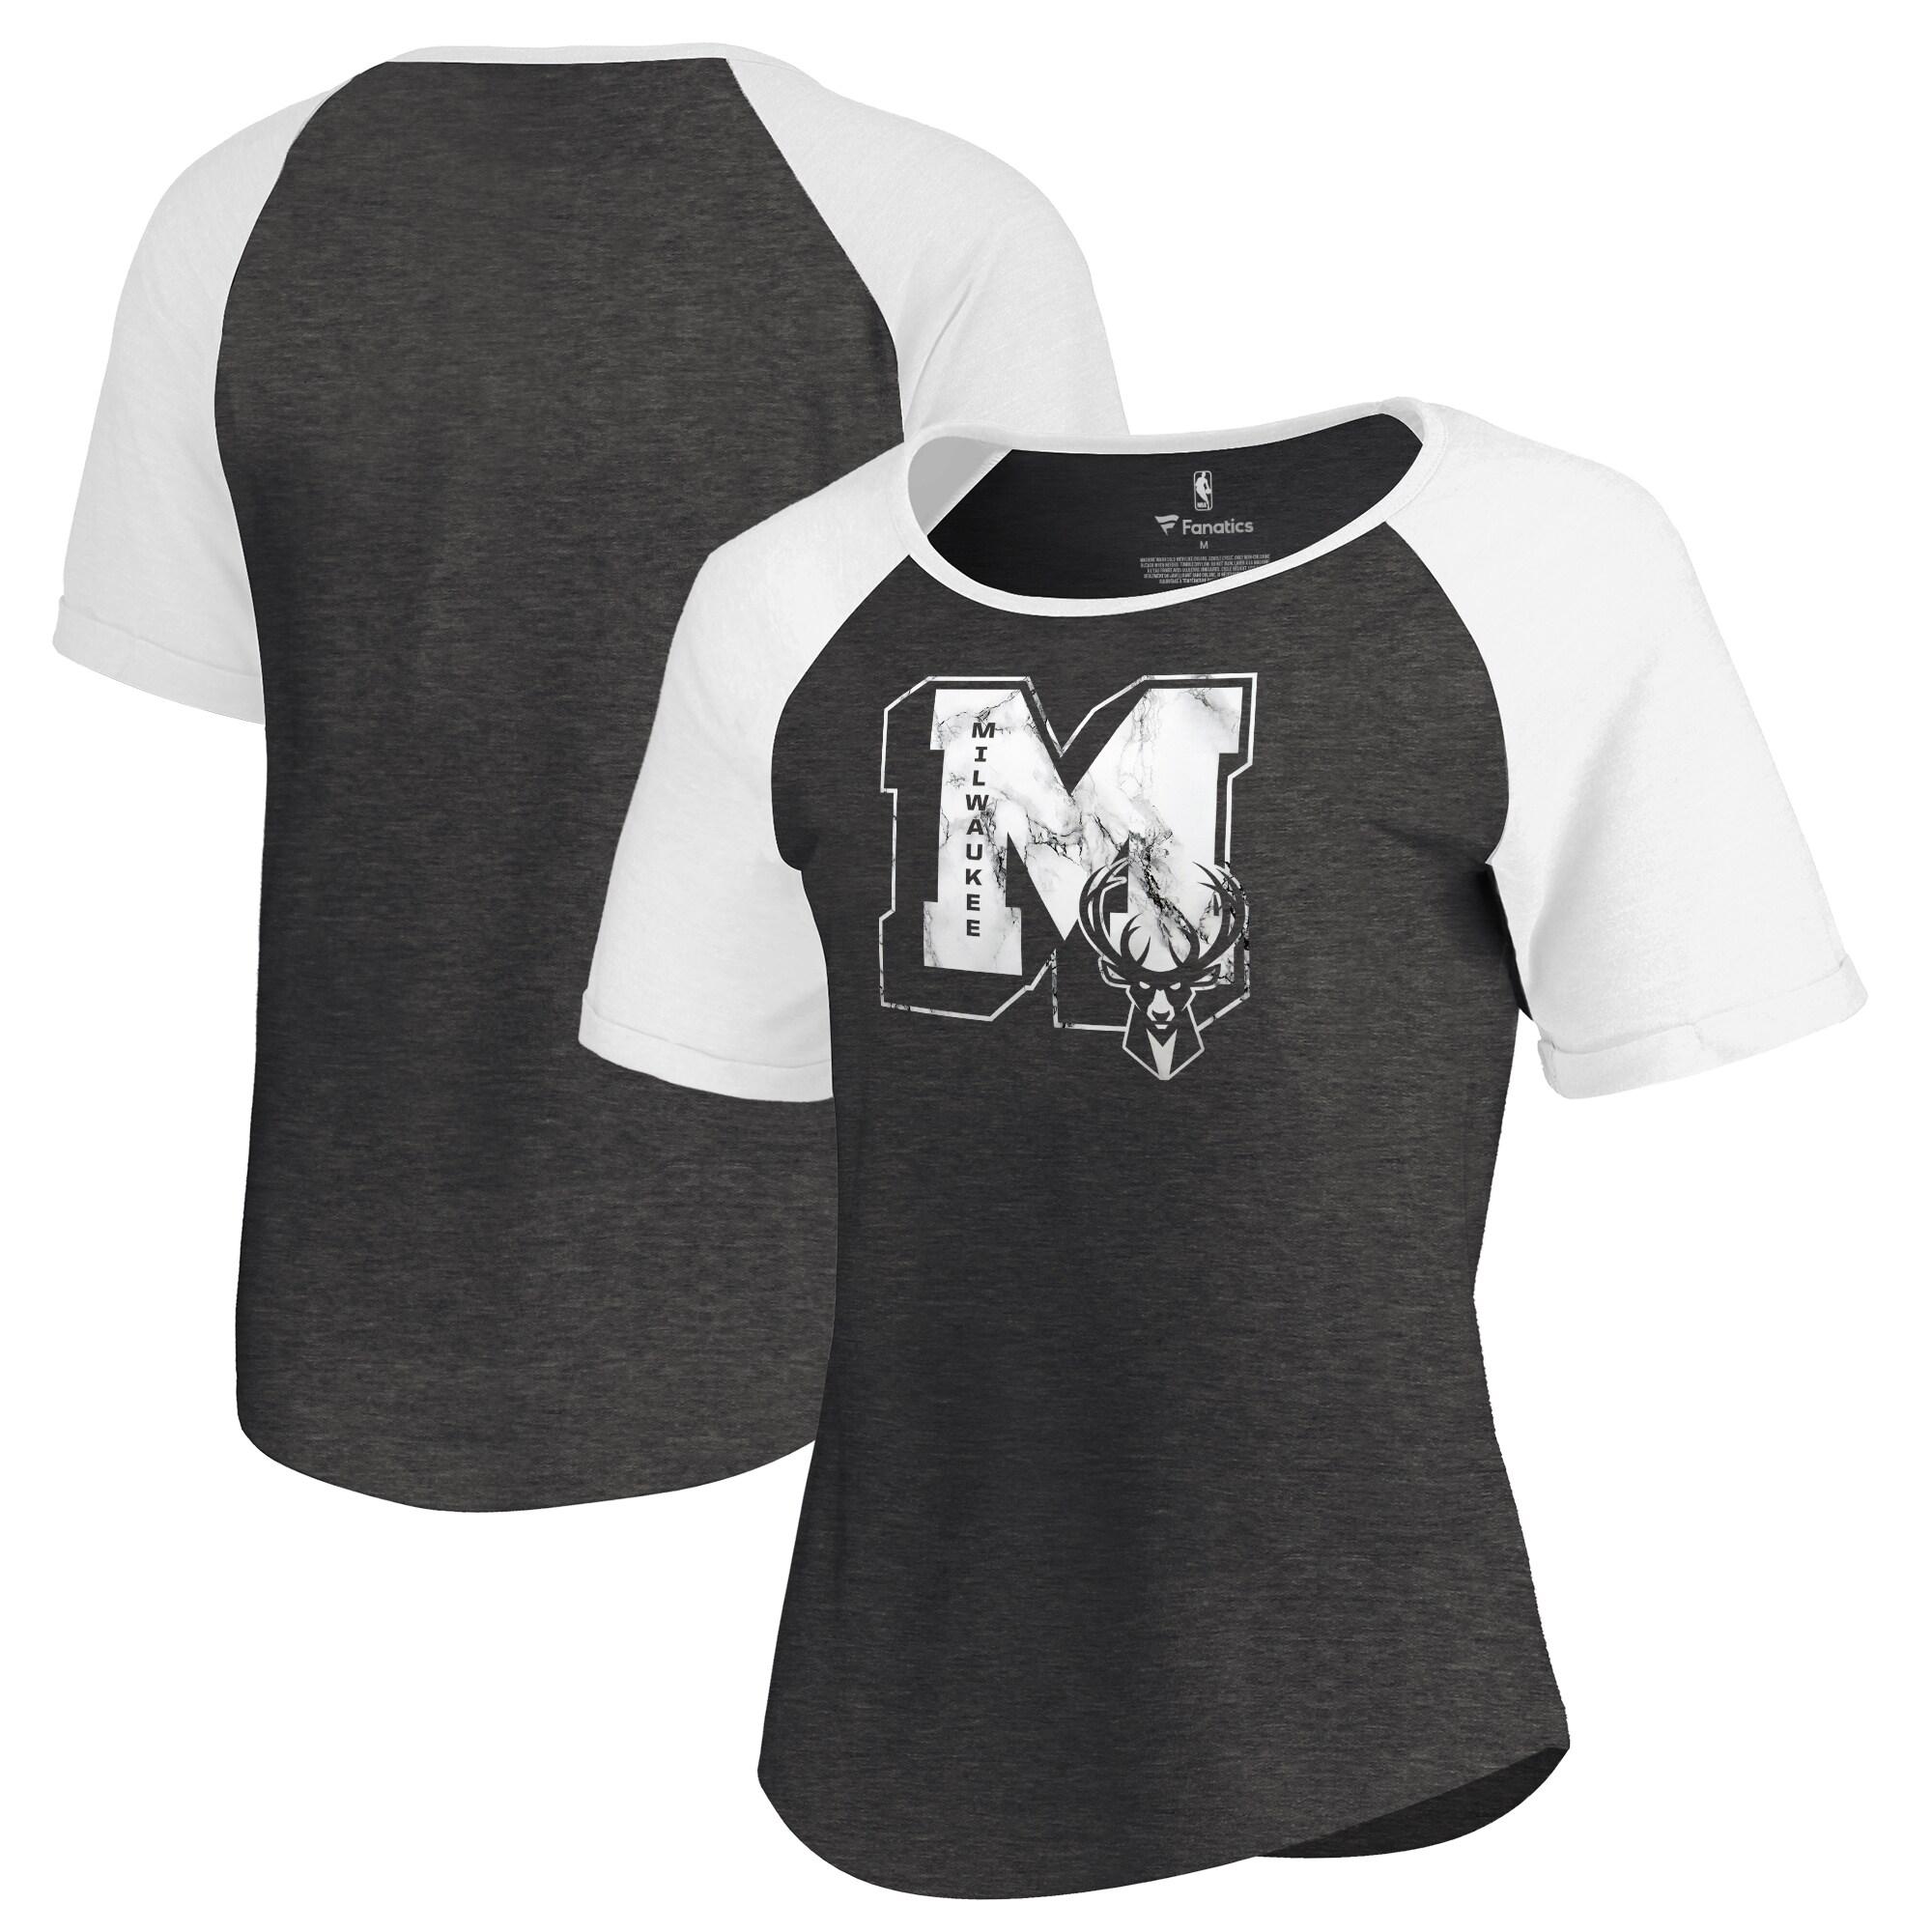 Milwaukee Bucks Fanatics Branded Women's Letterman Tri-Blend Raglan T-Shirt - Black